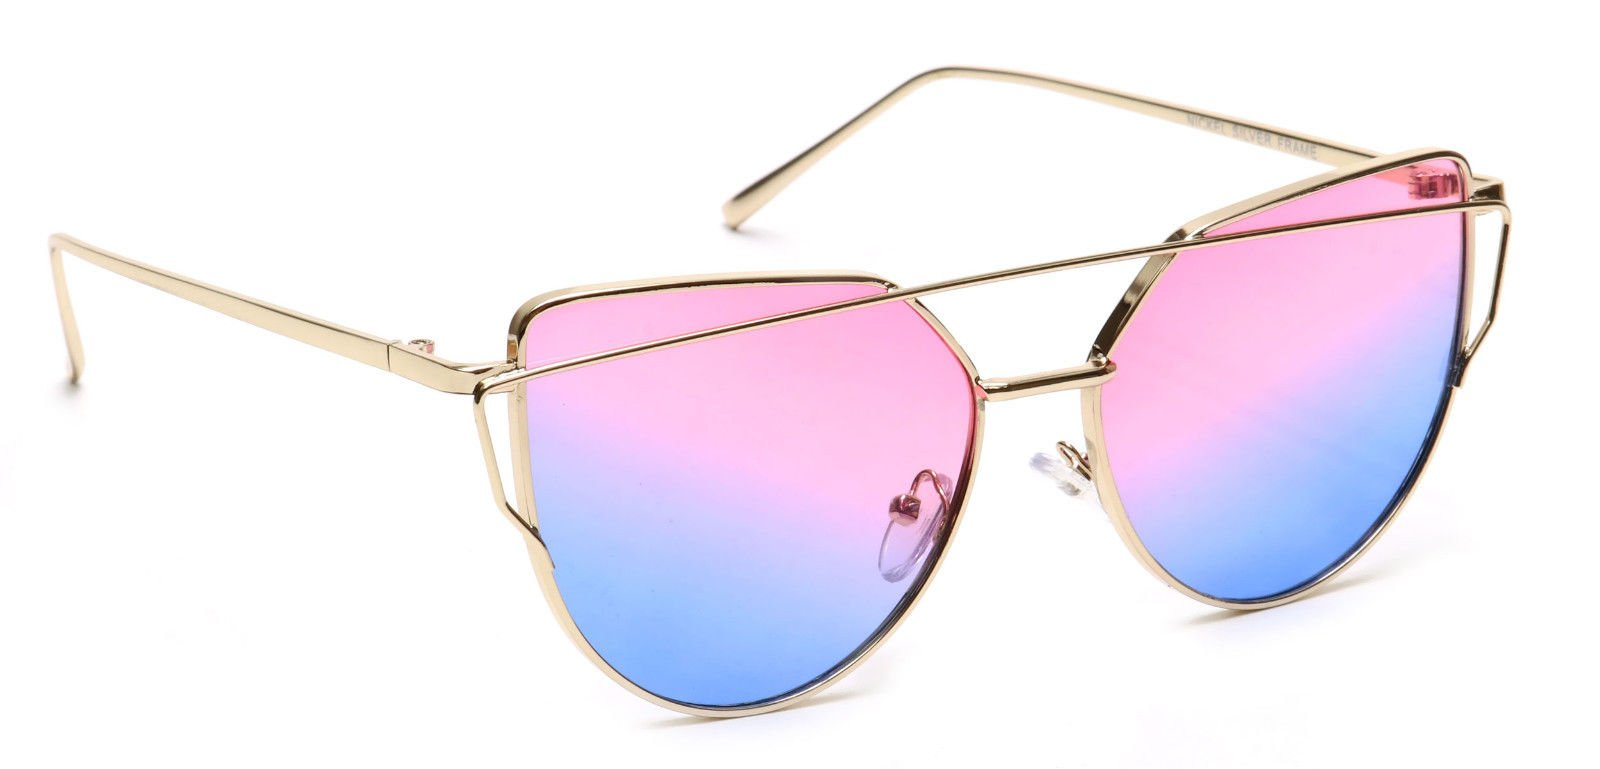 Tantino Sunglasses Cat Eye Fashion Mirror or Transparent Lens Love Punch Style (MEDIUM Pink/Blue Transparent, UV400)